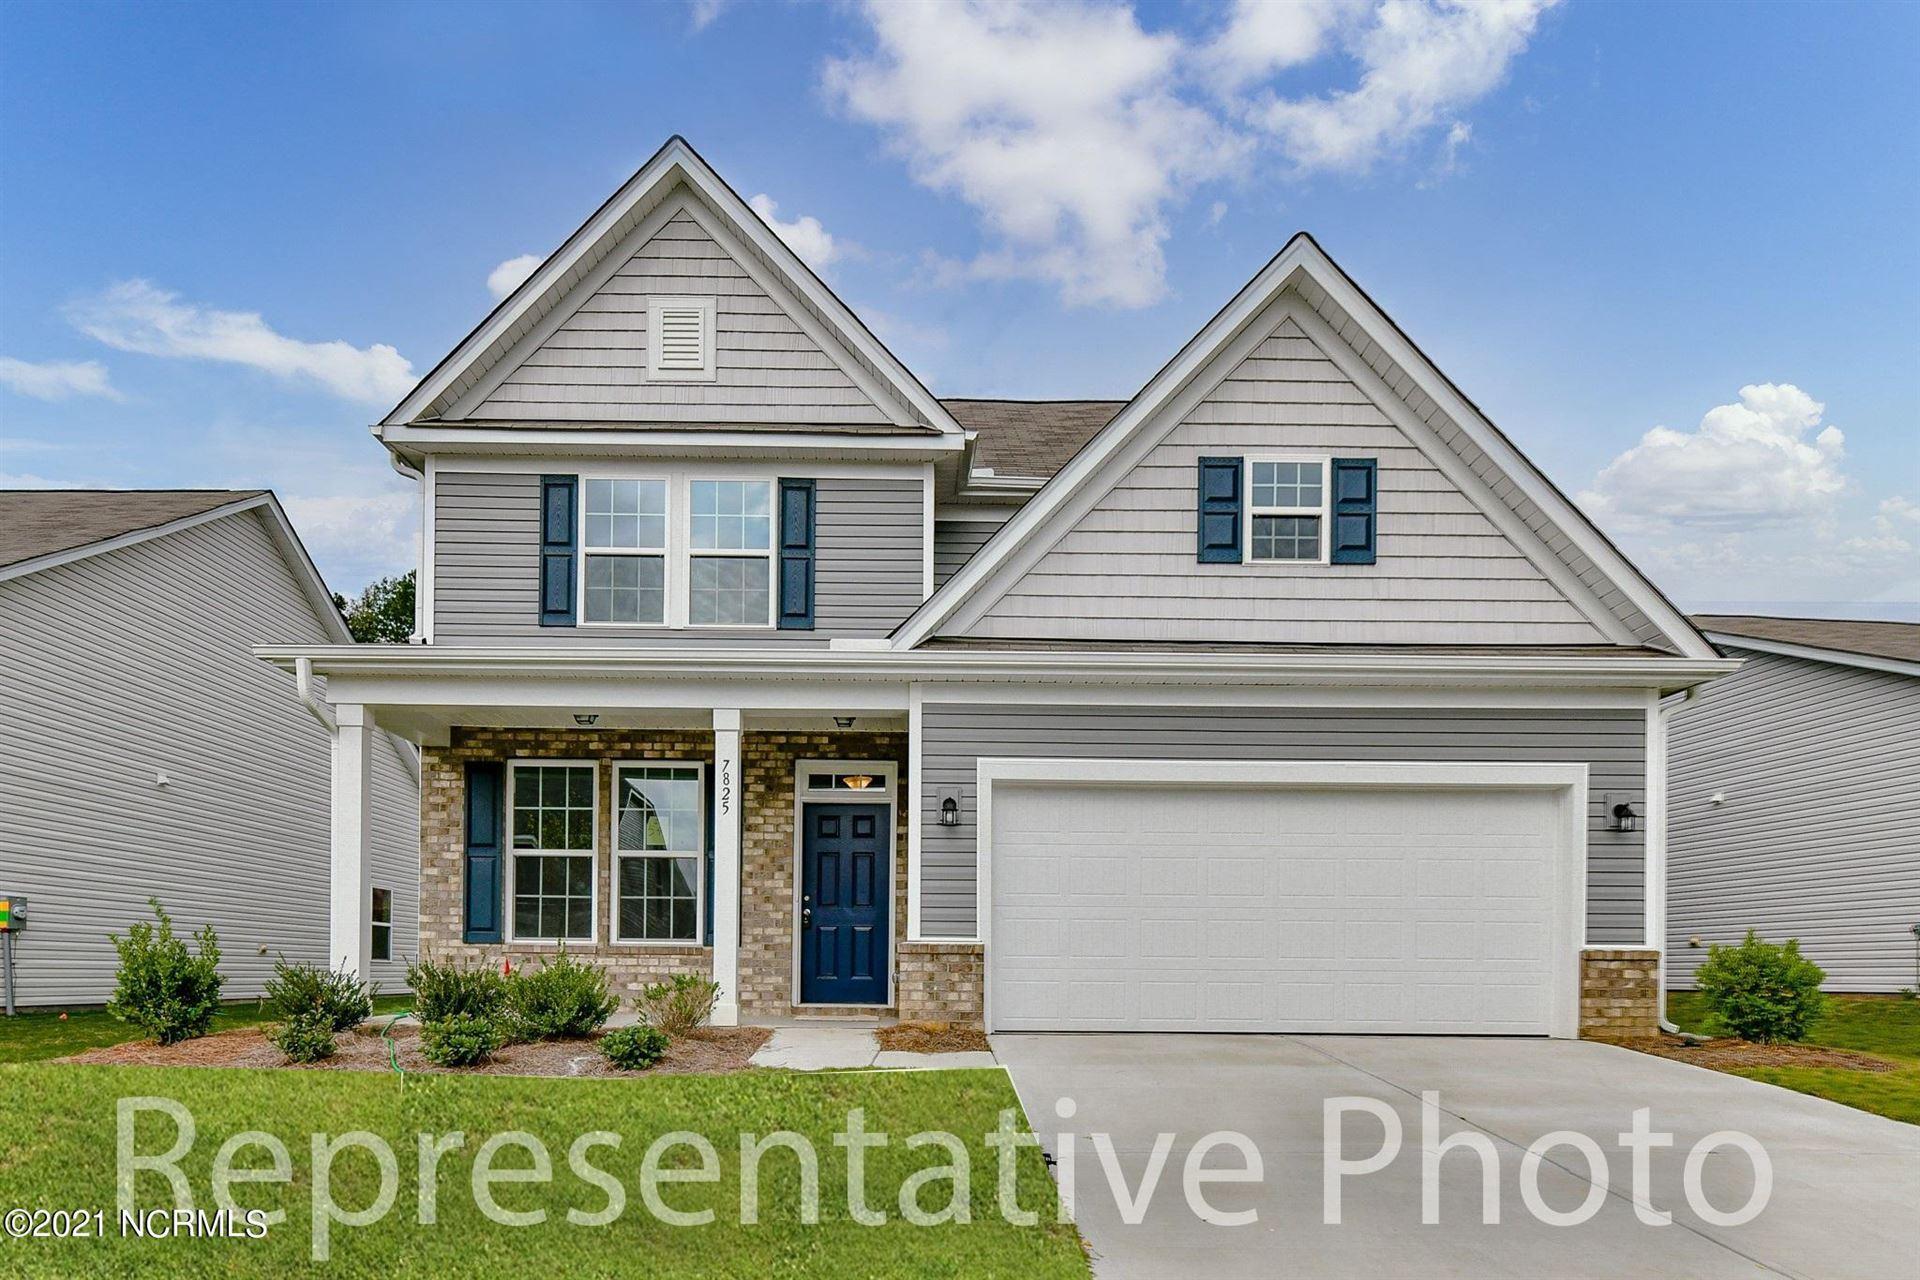 Photo of 16 Violetear Ridge #Lot 57, Hampstead, NC 28443 (MLS # 100255842)